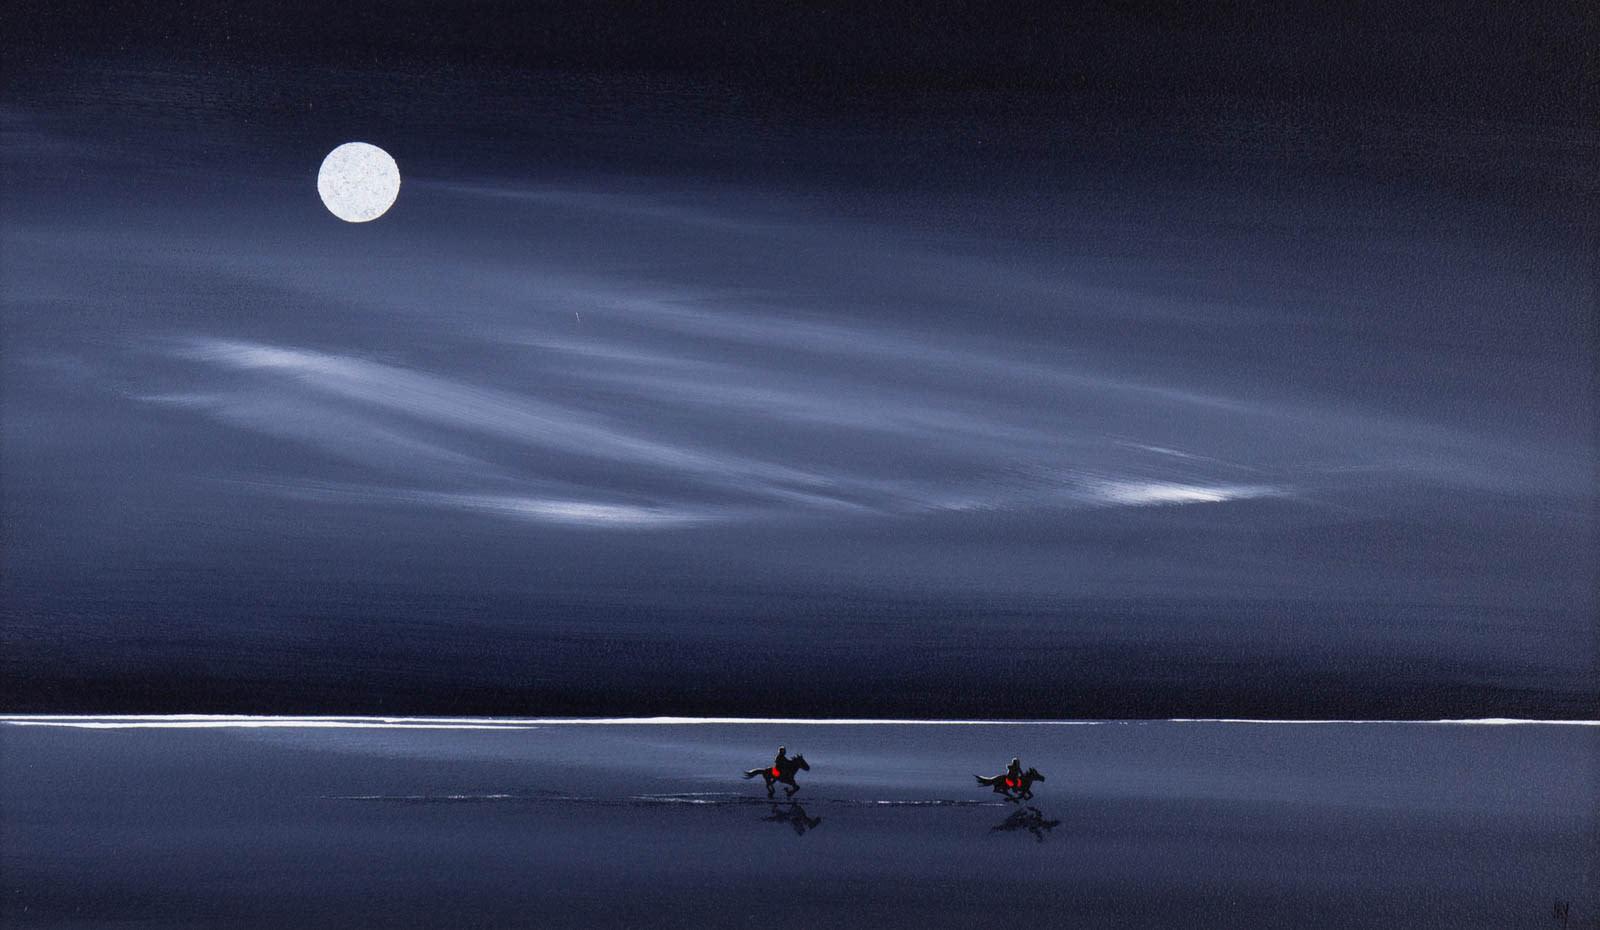 Galloping Through Dreams